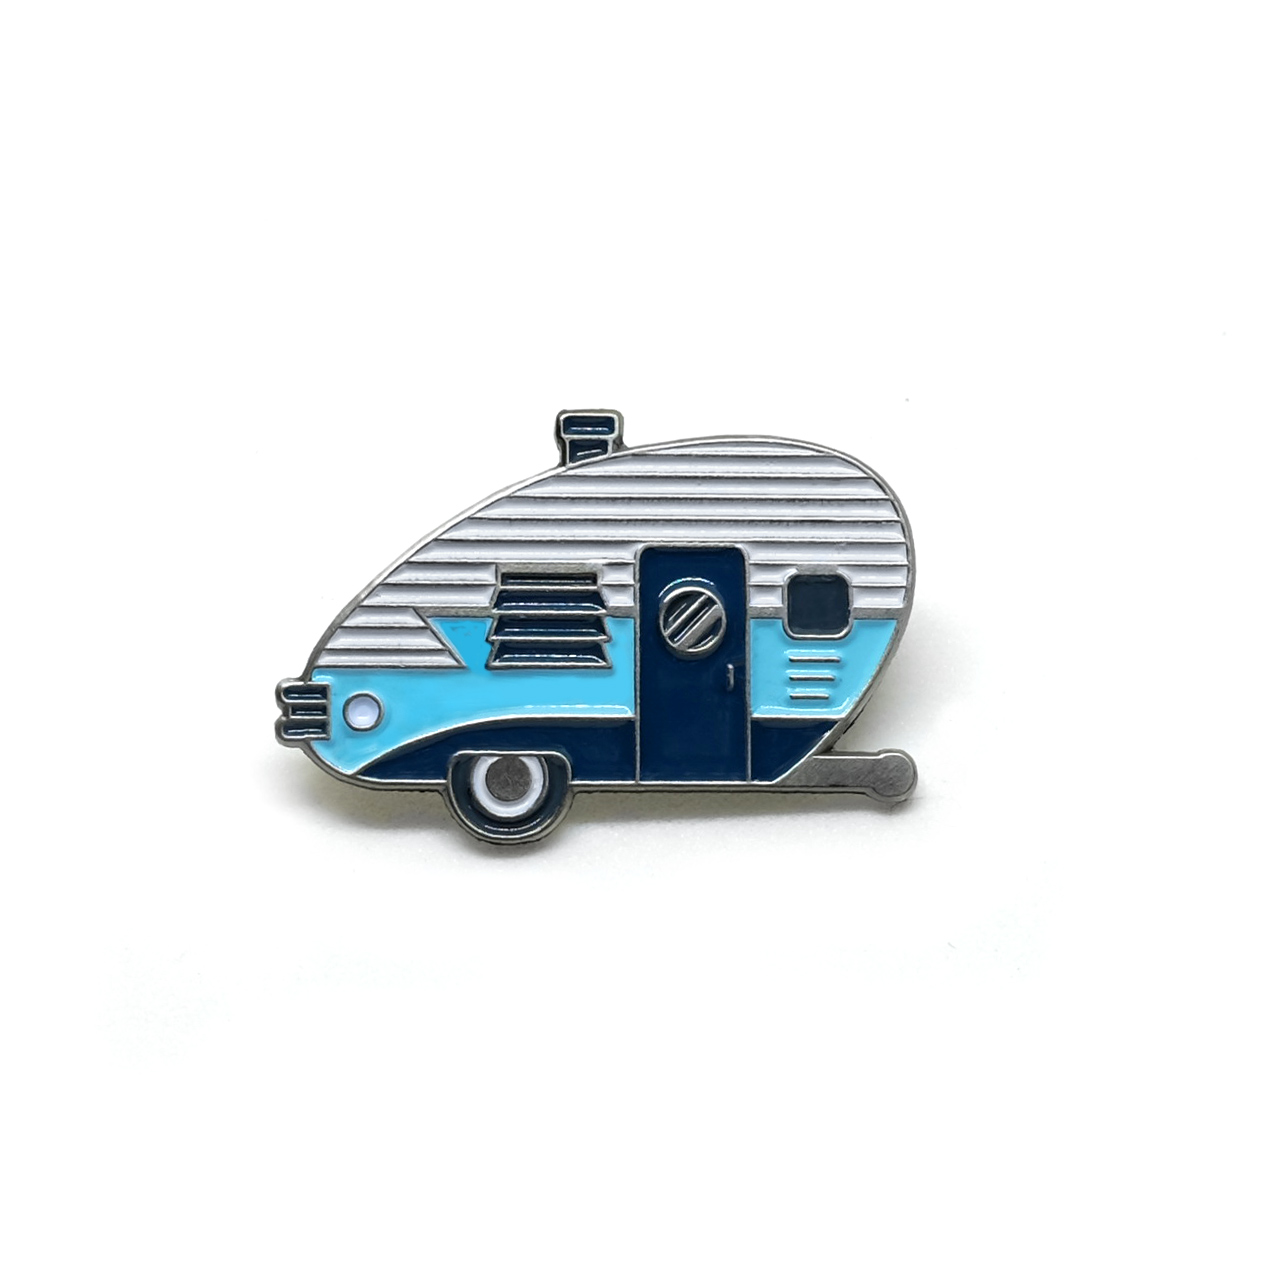 "LLS010-B : Camper (Blue) Soft enamel pin 1.1"" x 0.75"" $4 ETA TBD"